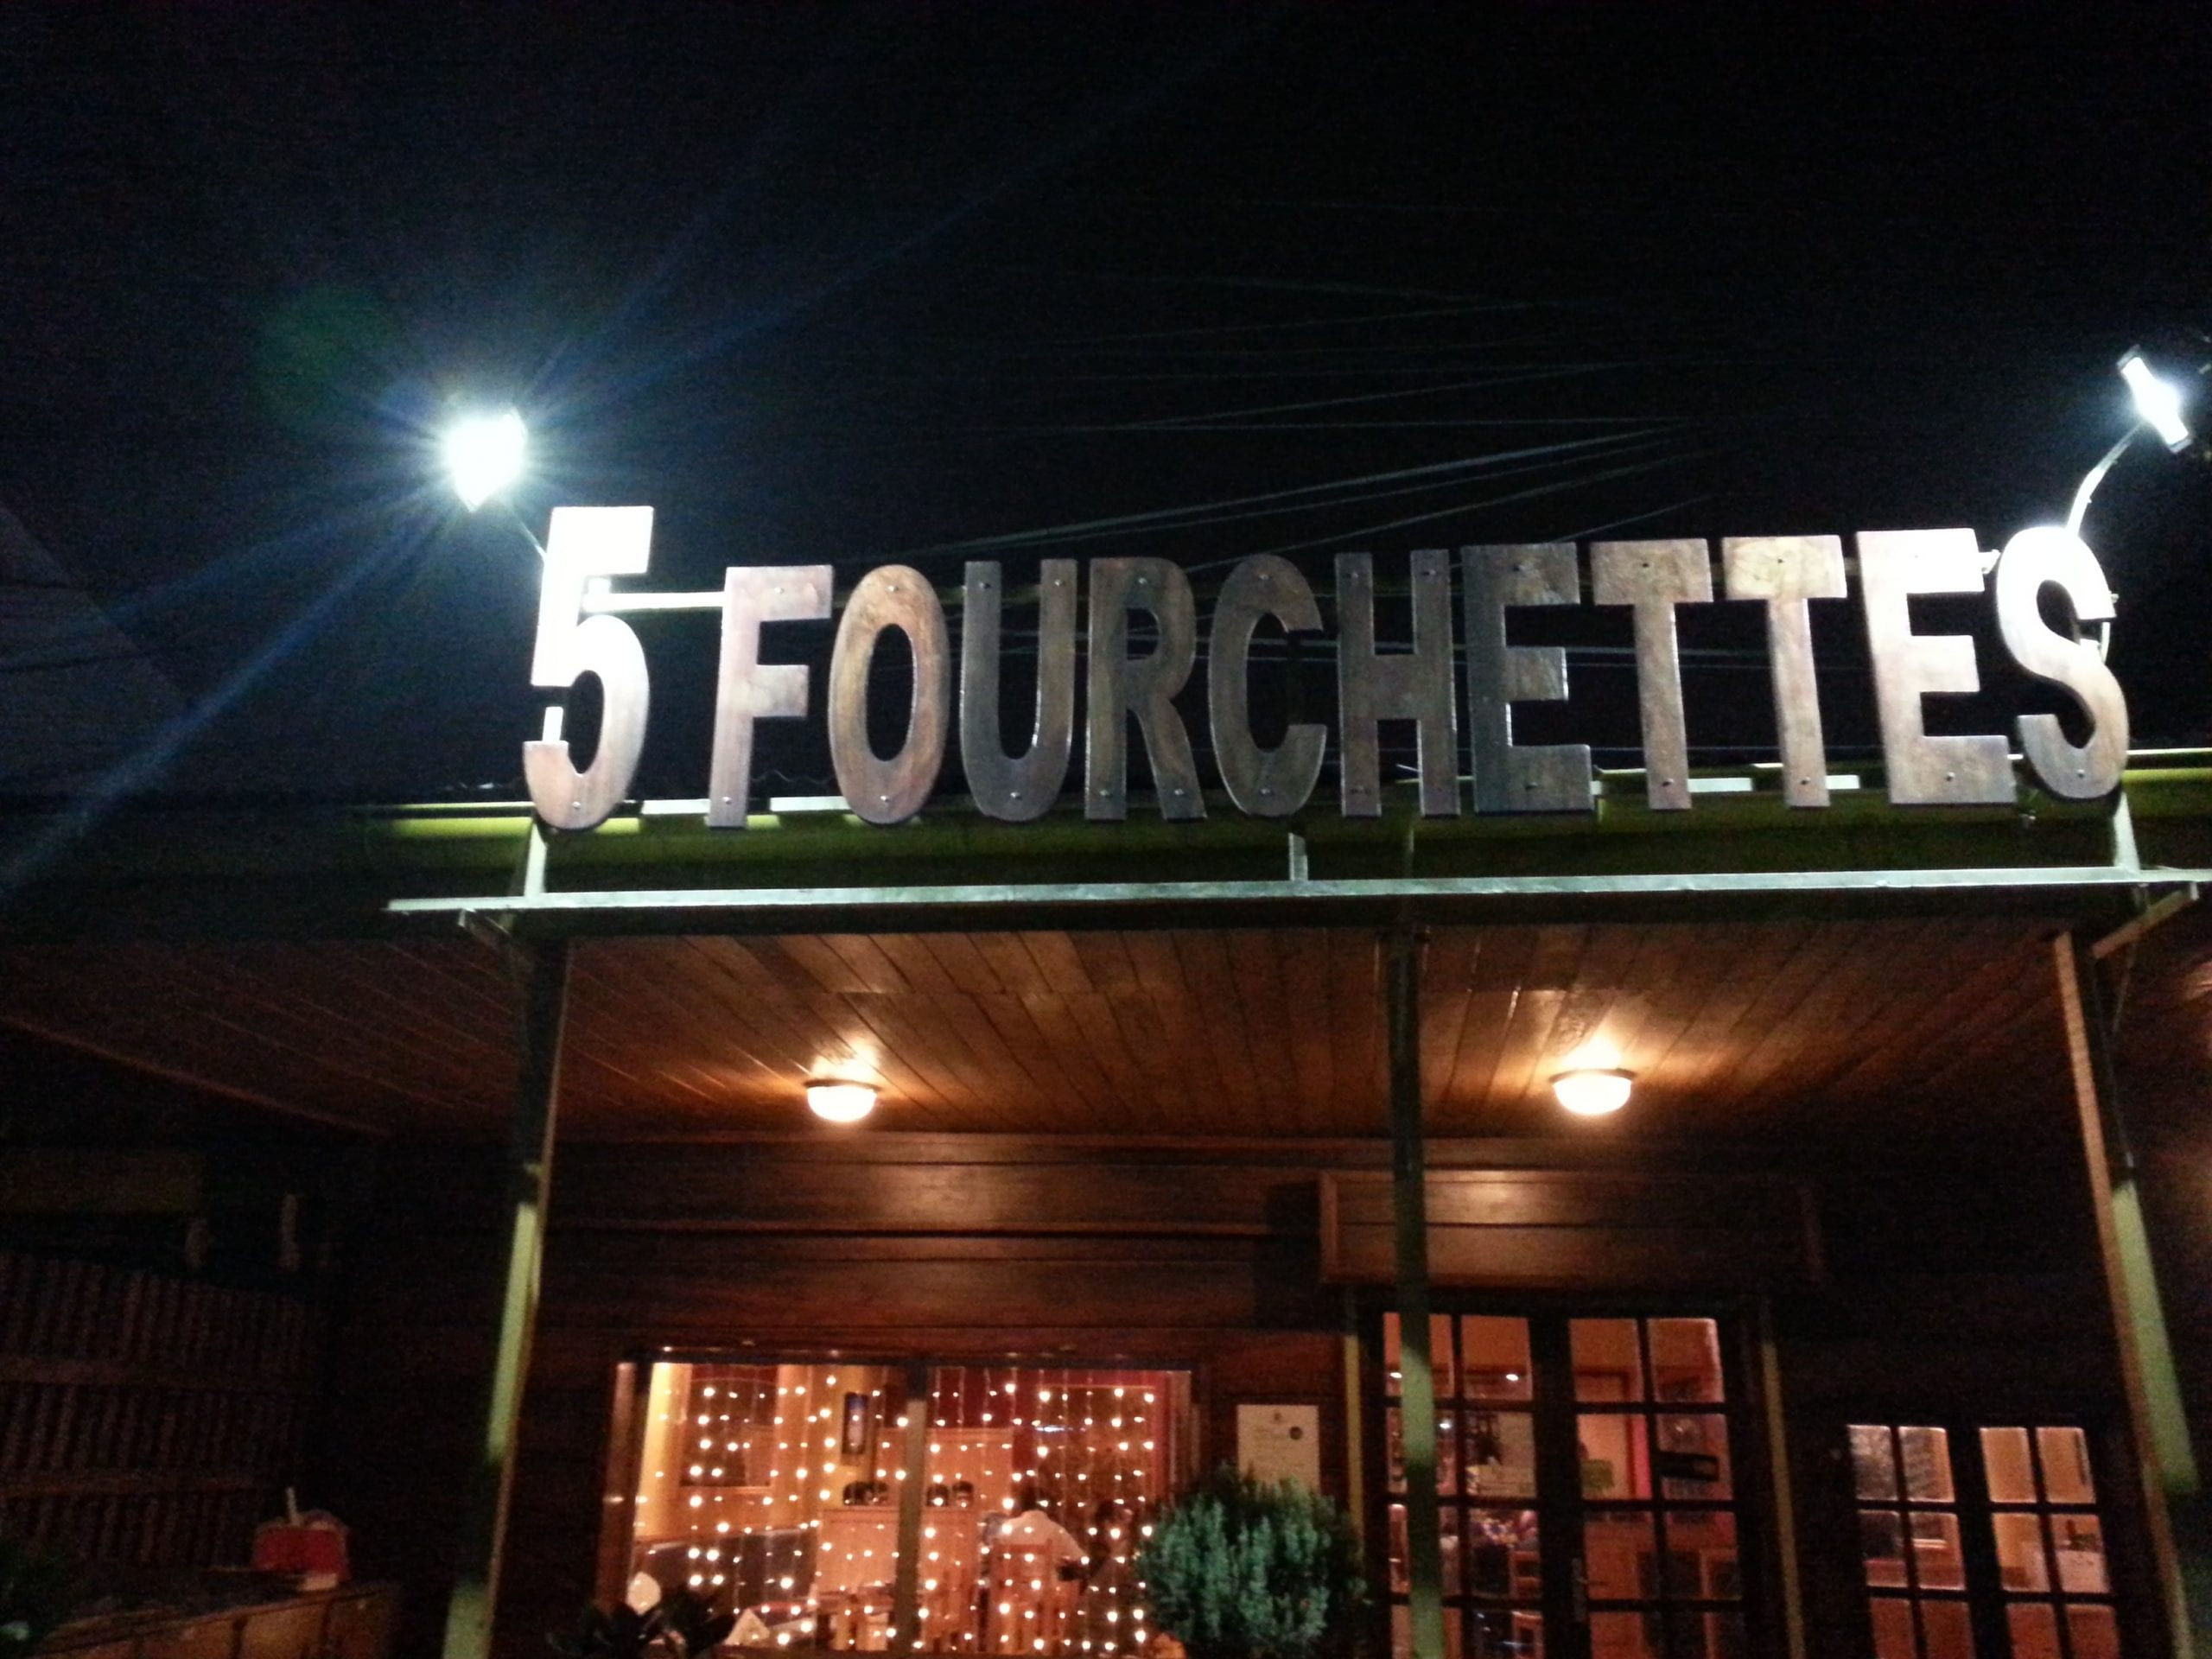 5 Fourchettes 10 Top Restaurants in Douala